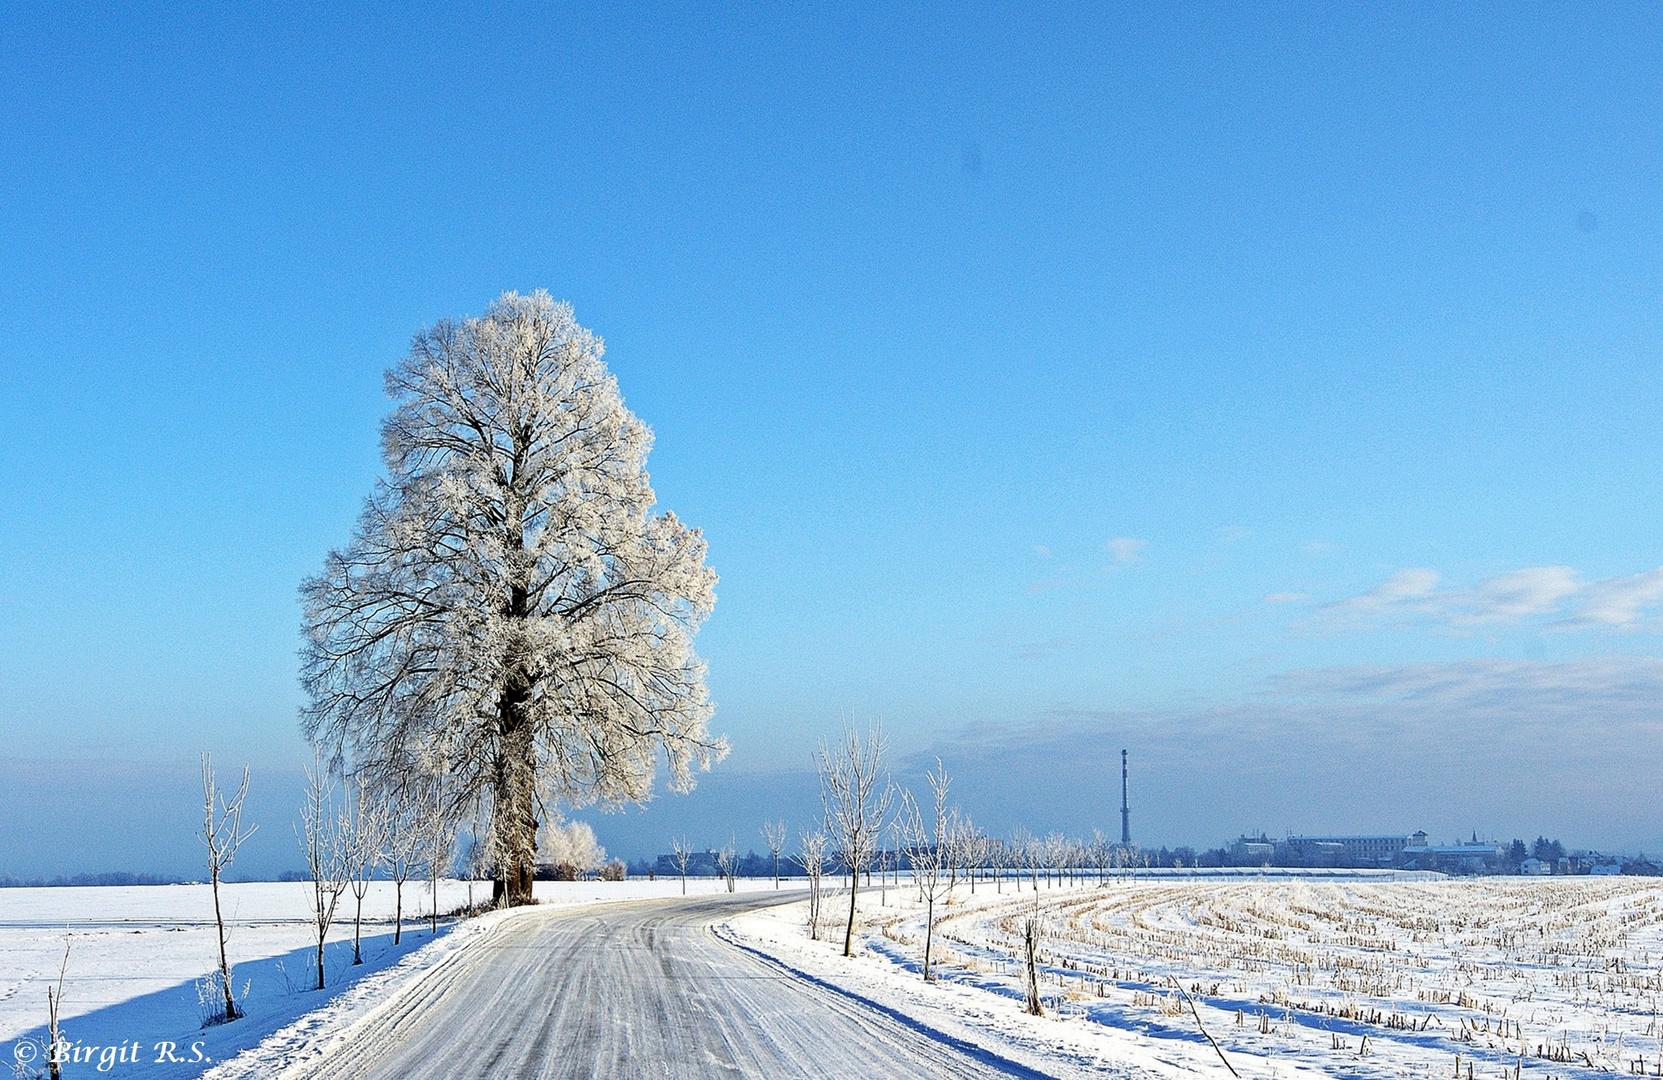 Perfekter Wintertag in Böhmen